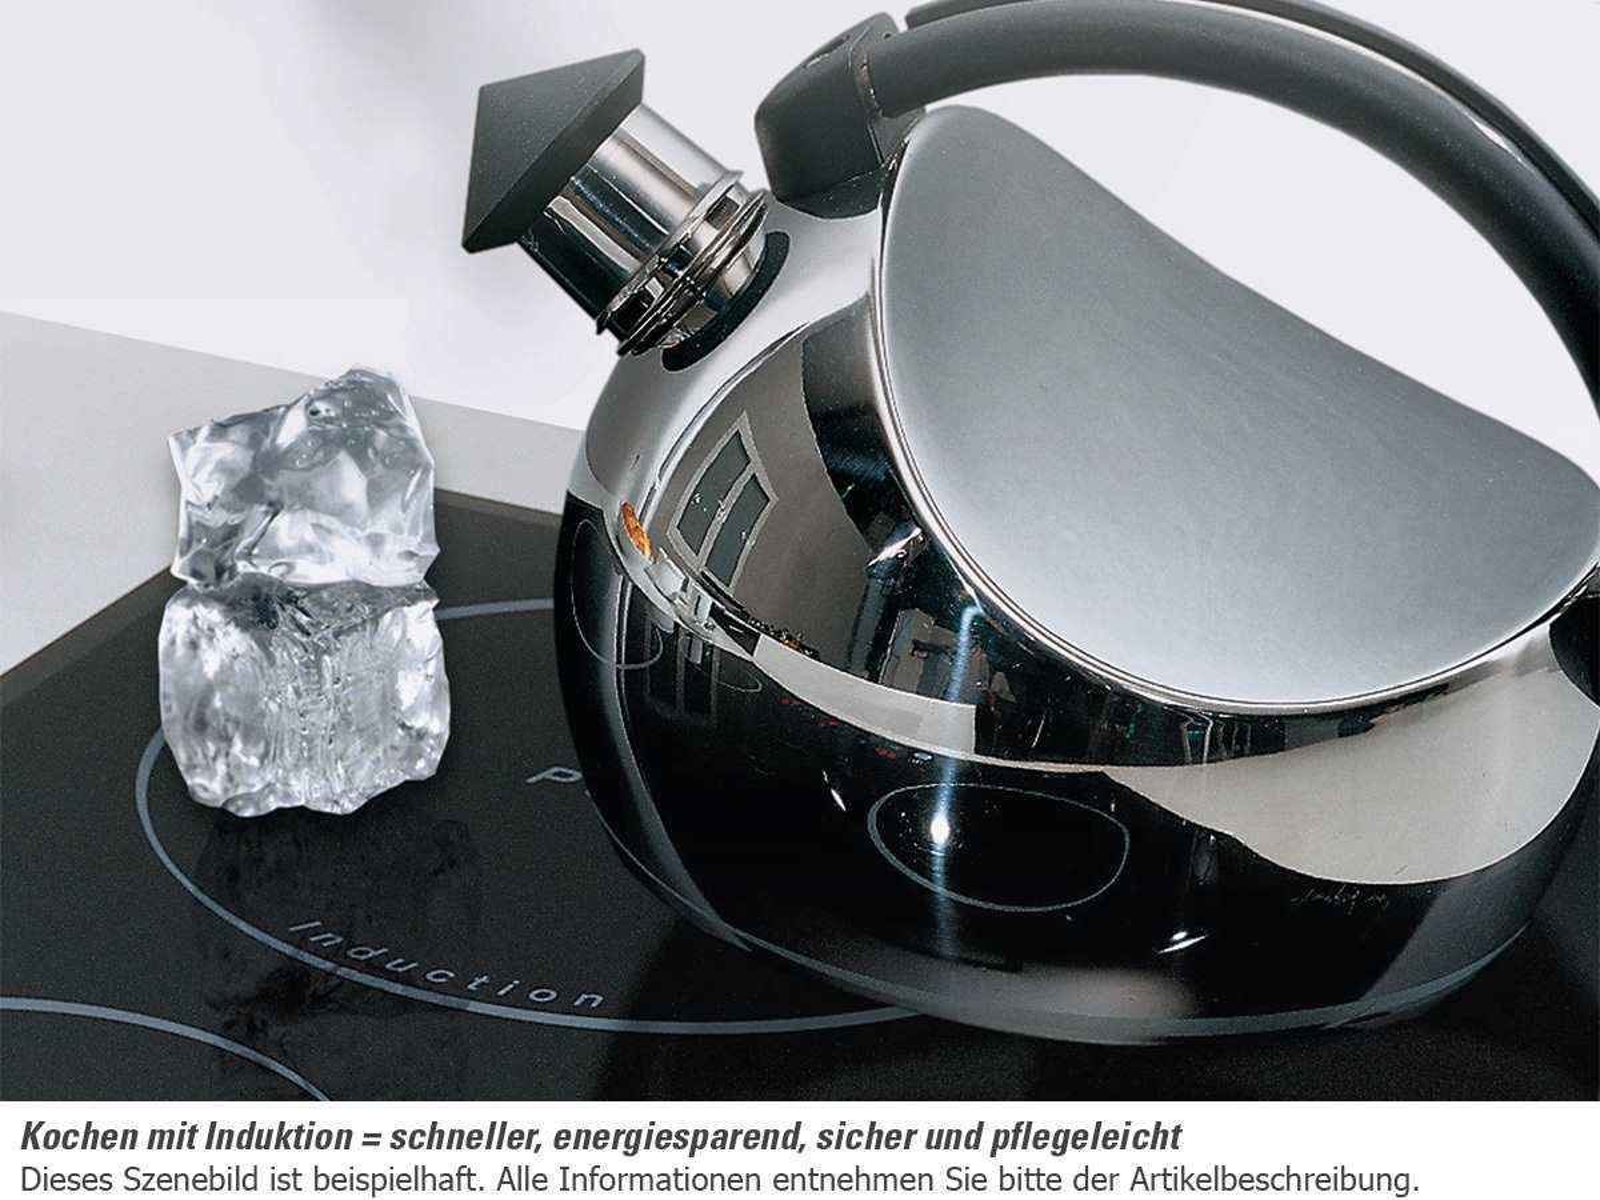 teka irf 644 induktionskochfeld autark. Black Bedroom Furniture Sets. Home Design Ideas